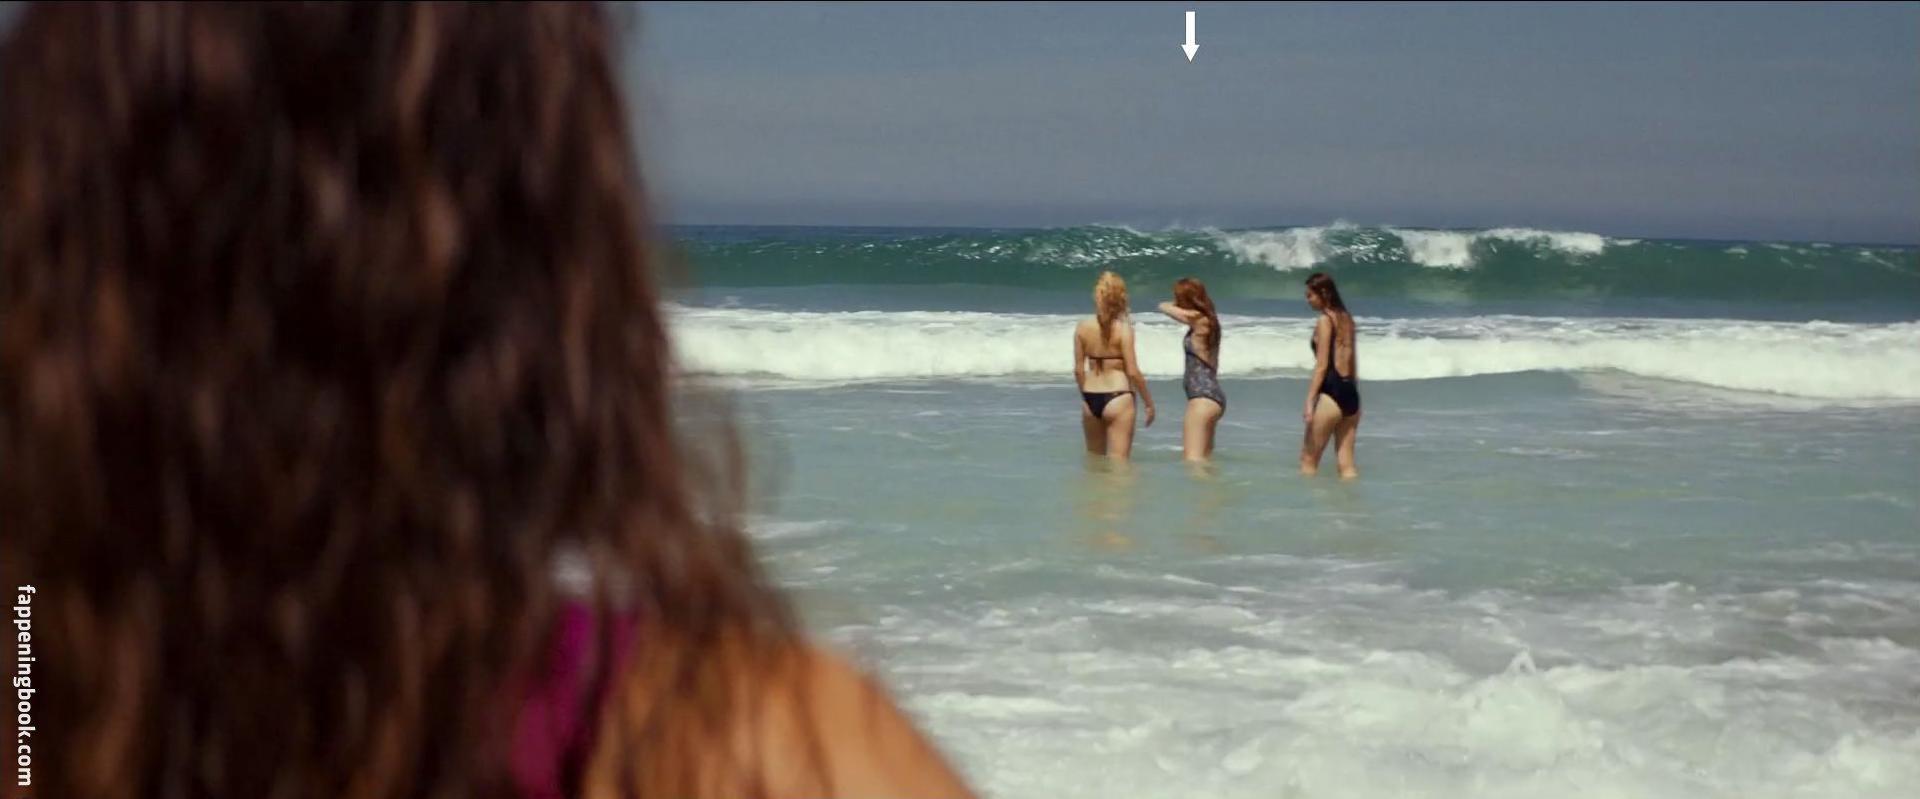 Alison Steadman Nude alison wheeler nude, sexy, the fappening, uncensored - photo